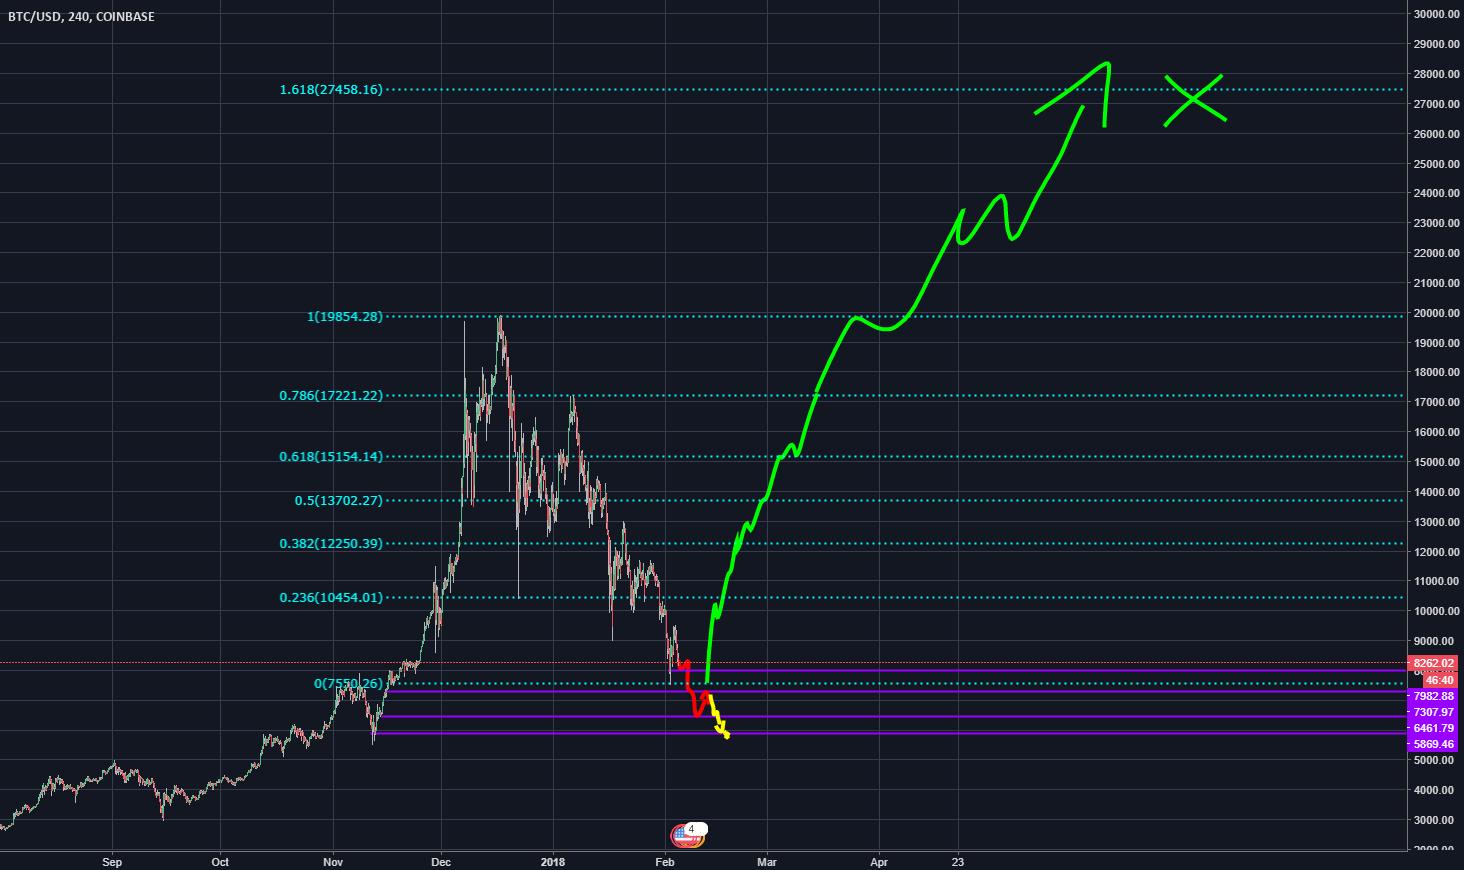 BTC/USD drop to $5.8k then $27 000 MOON